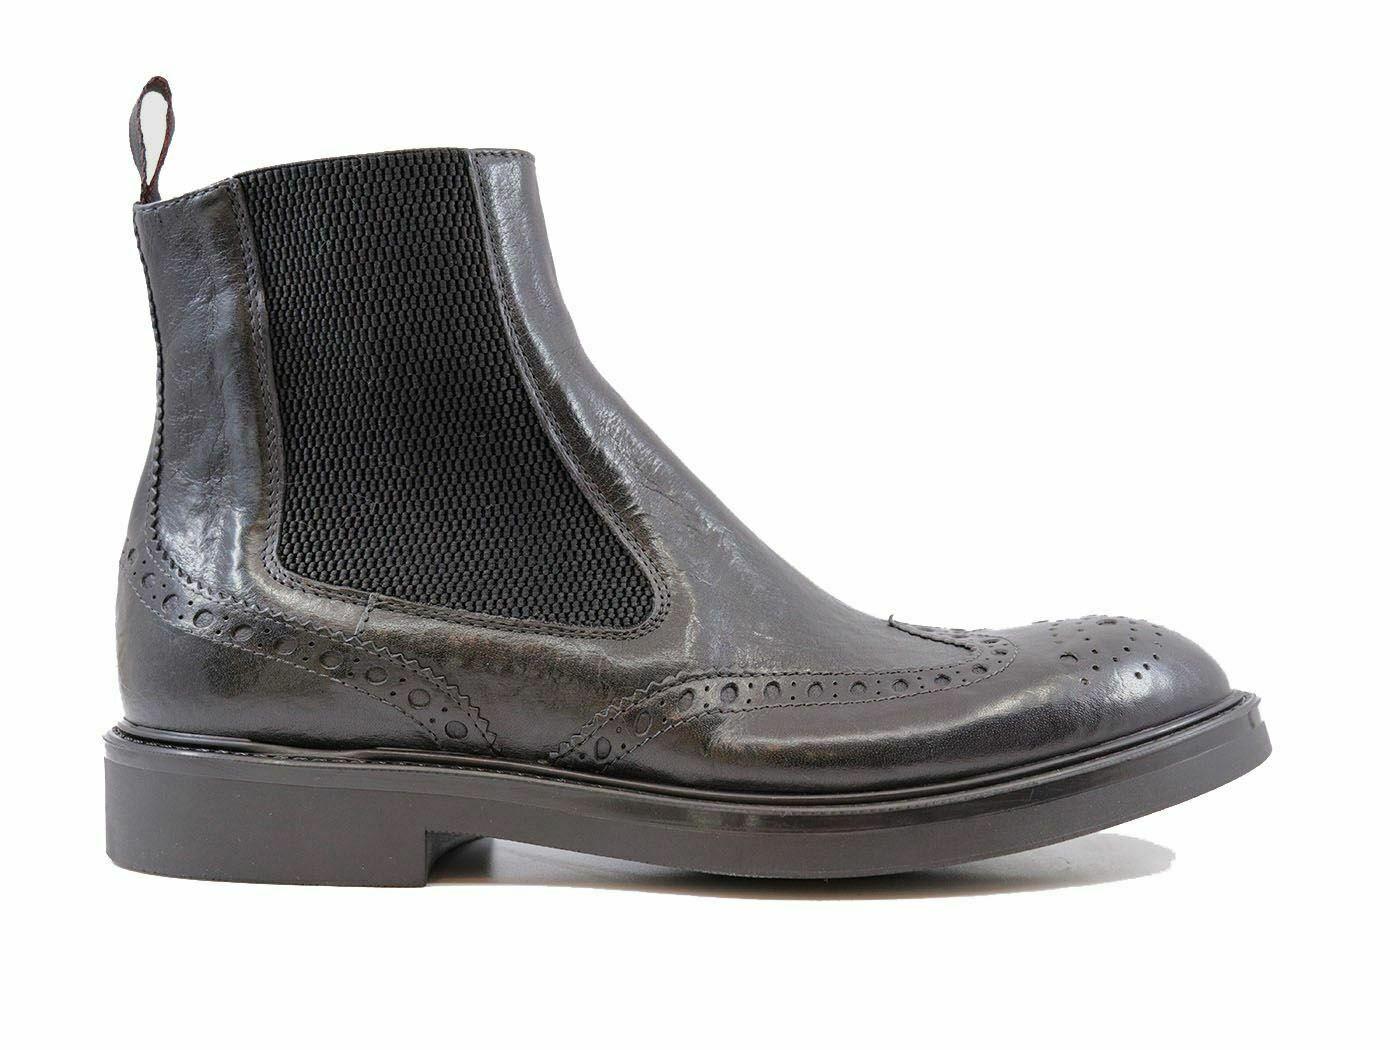 scarpe adidas uomo stivaletto nero